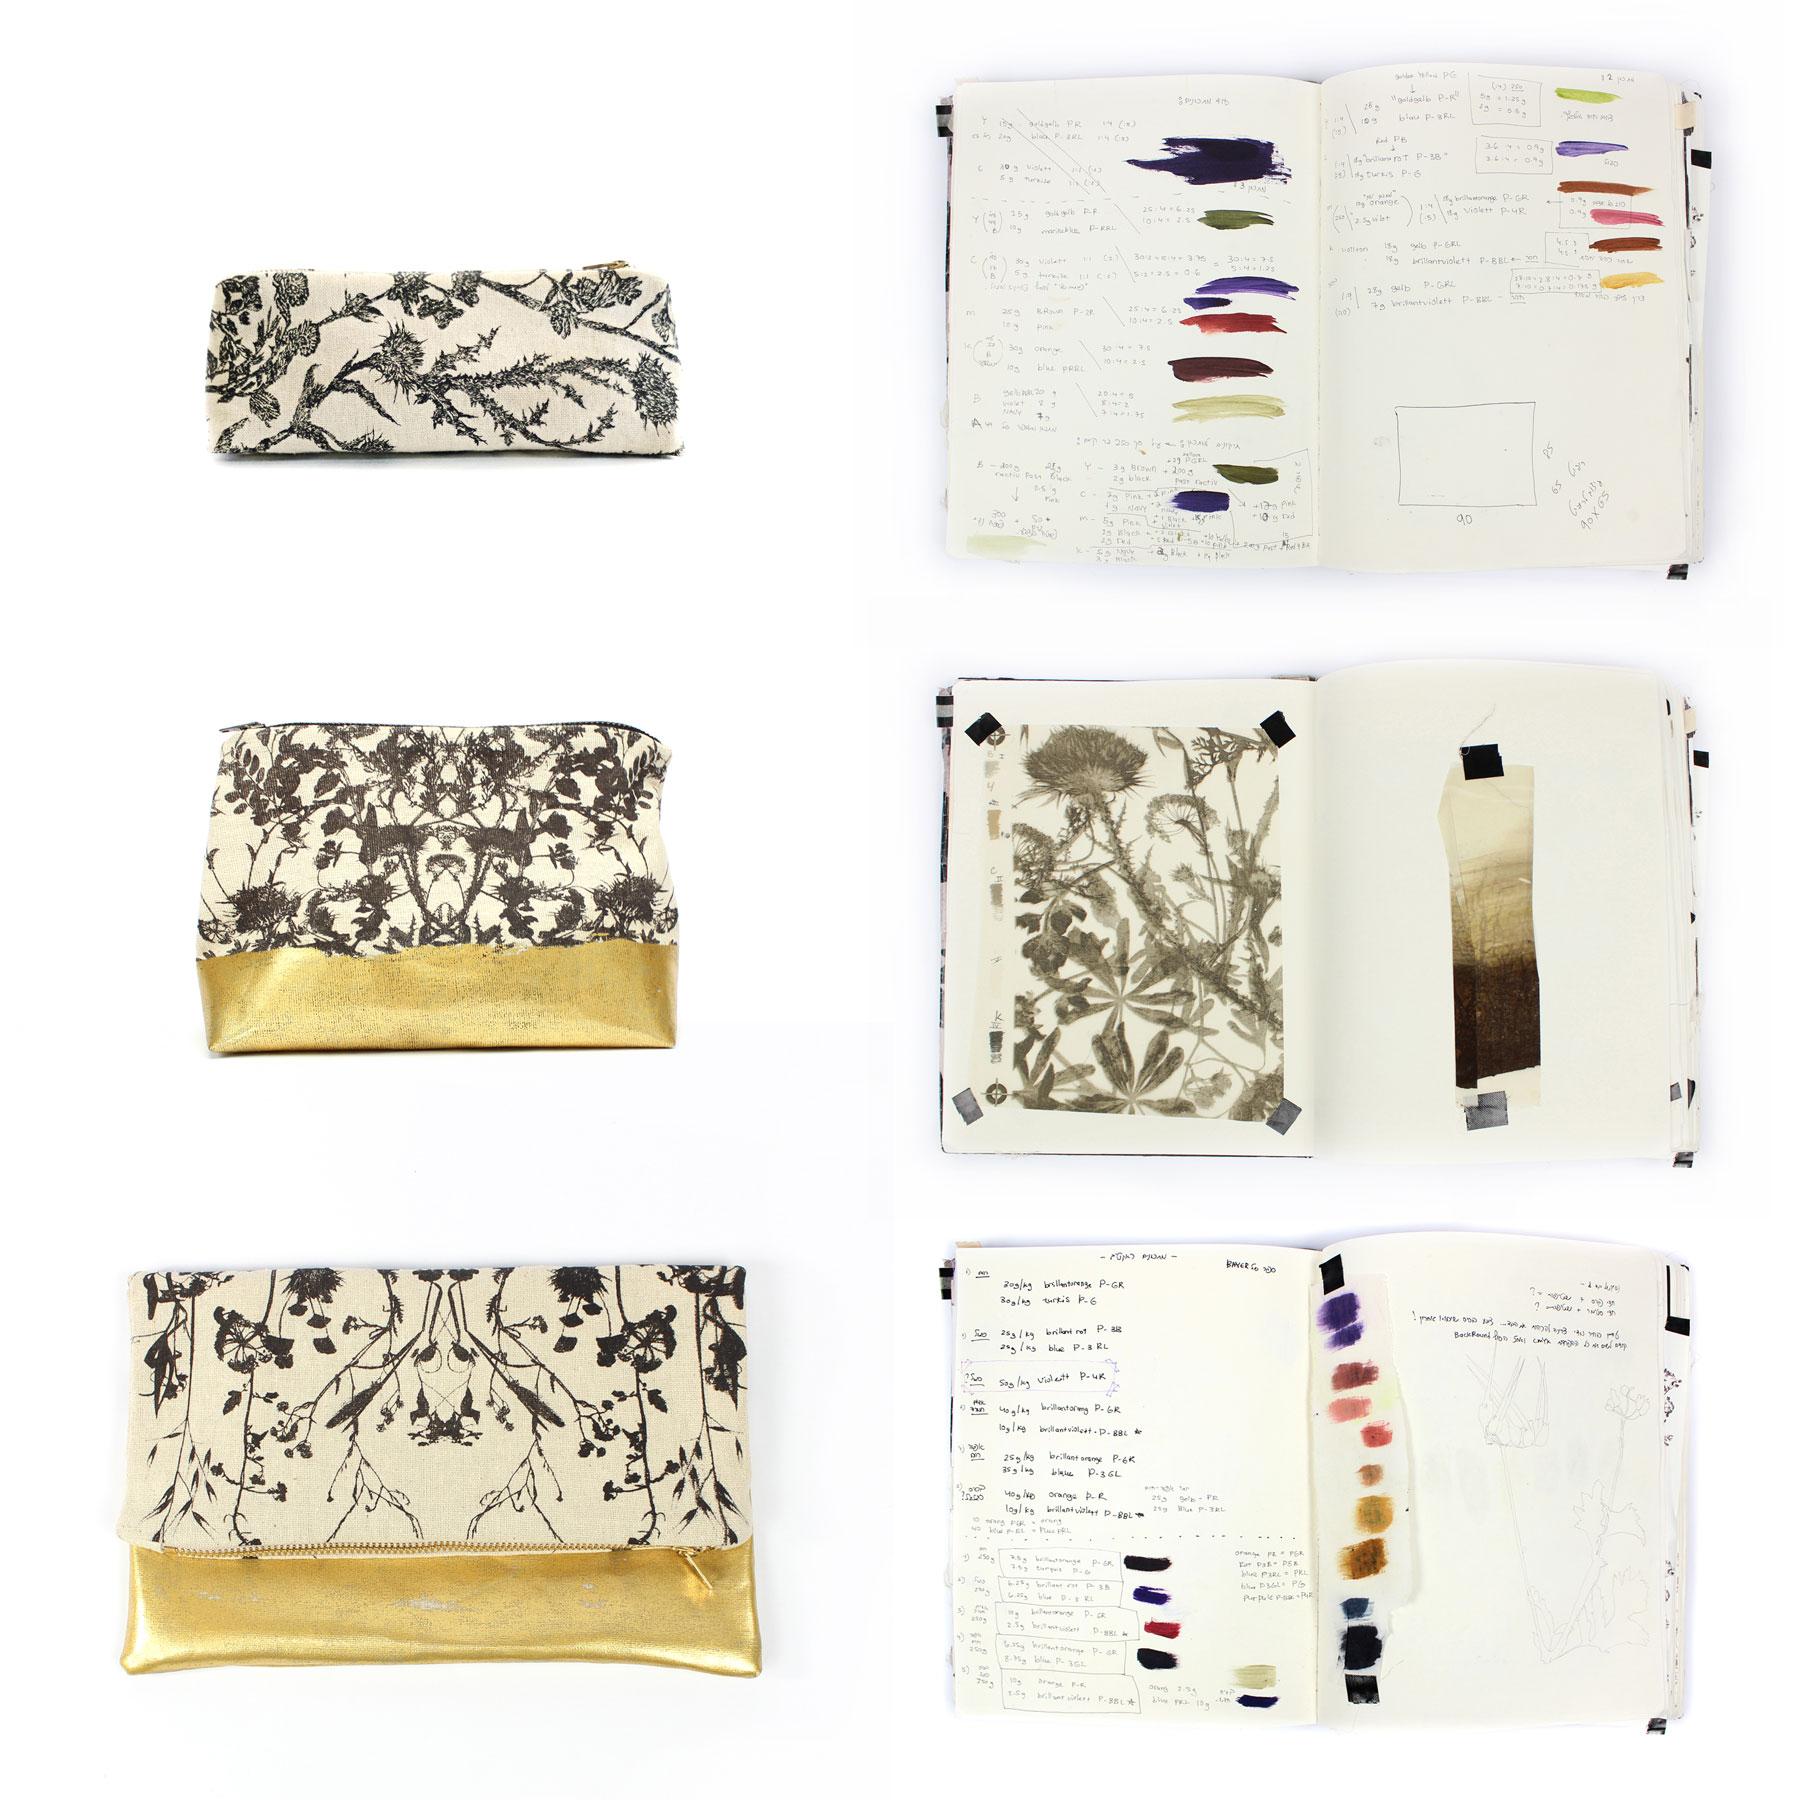 #Sketchbook #textiledesign #planetariumdesign